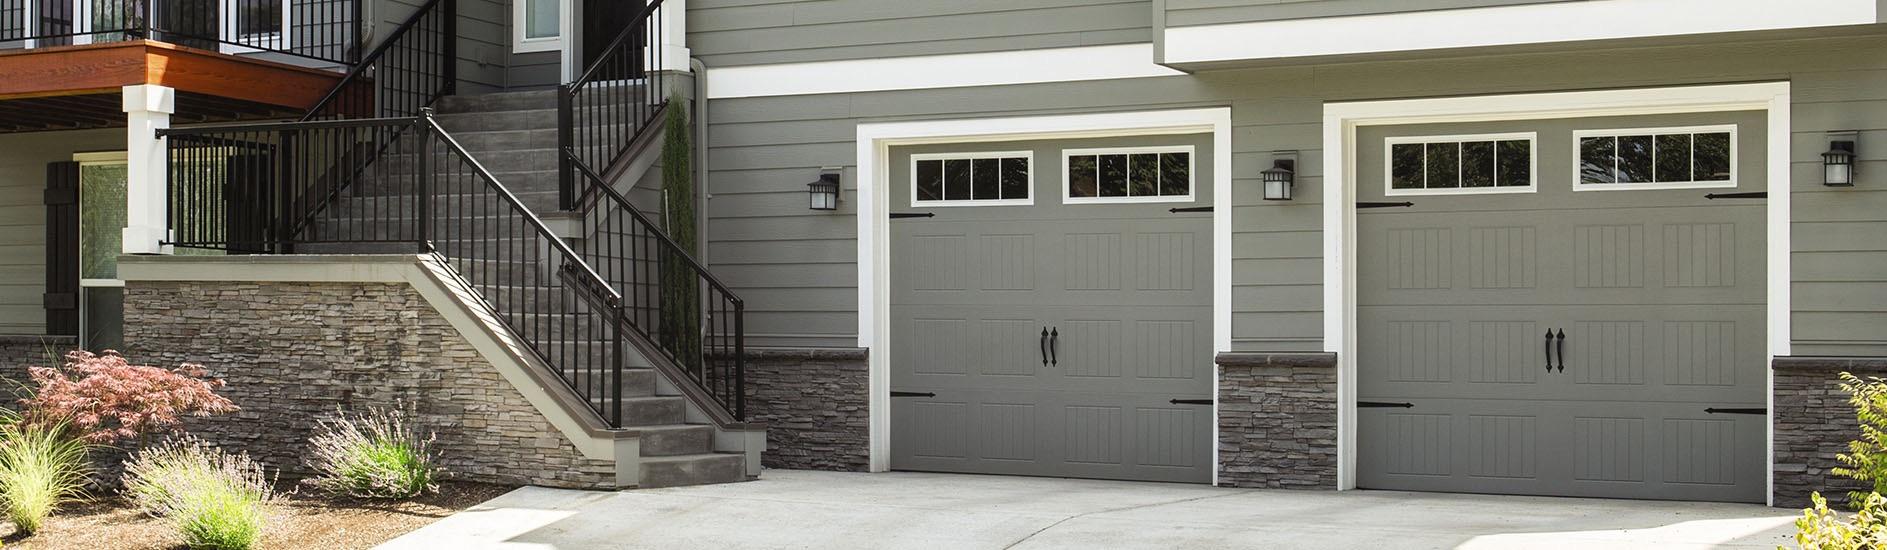 Residential & Commercial Door Installation & Repair | Home